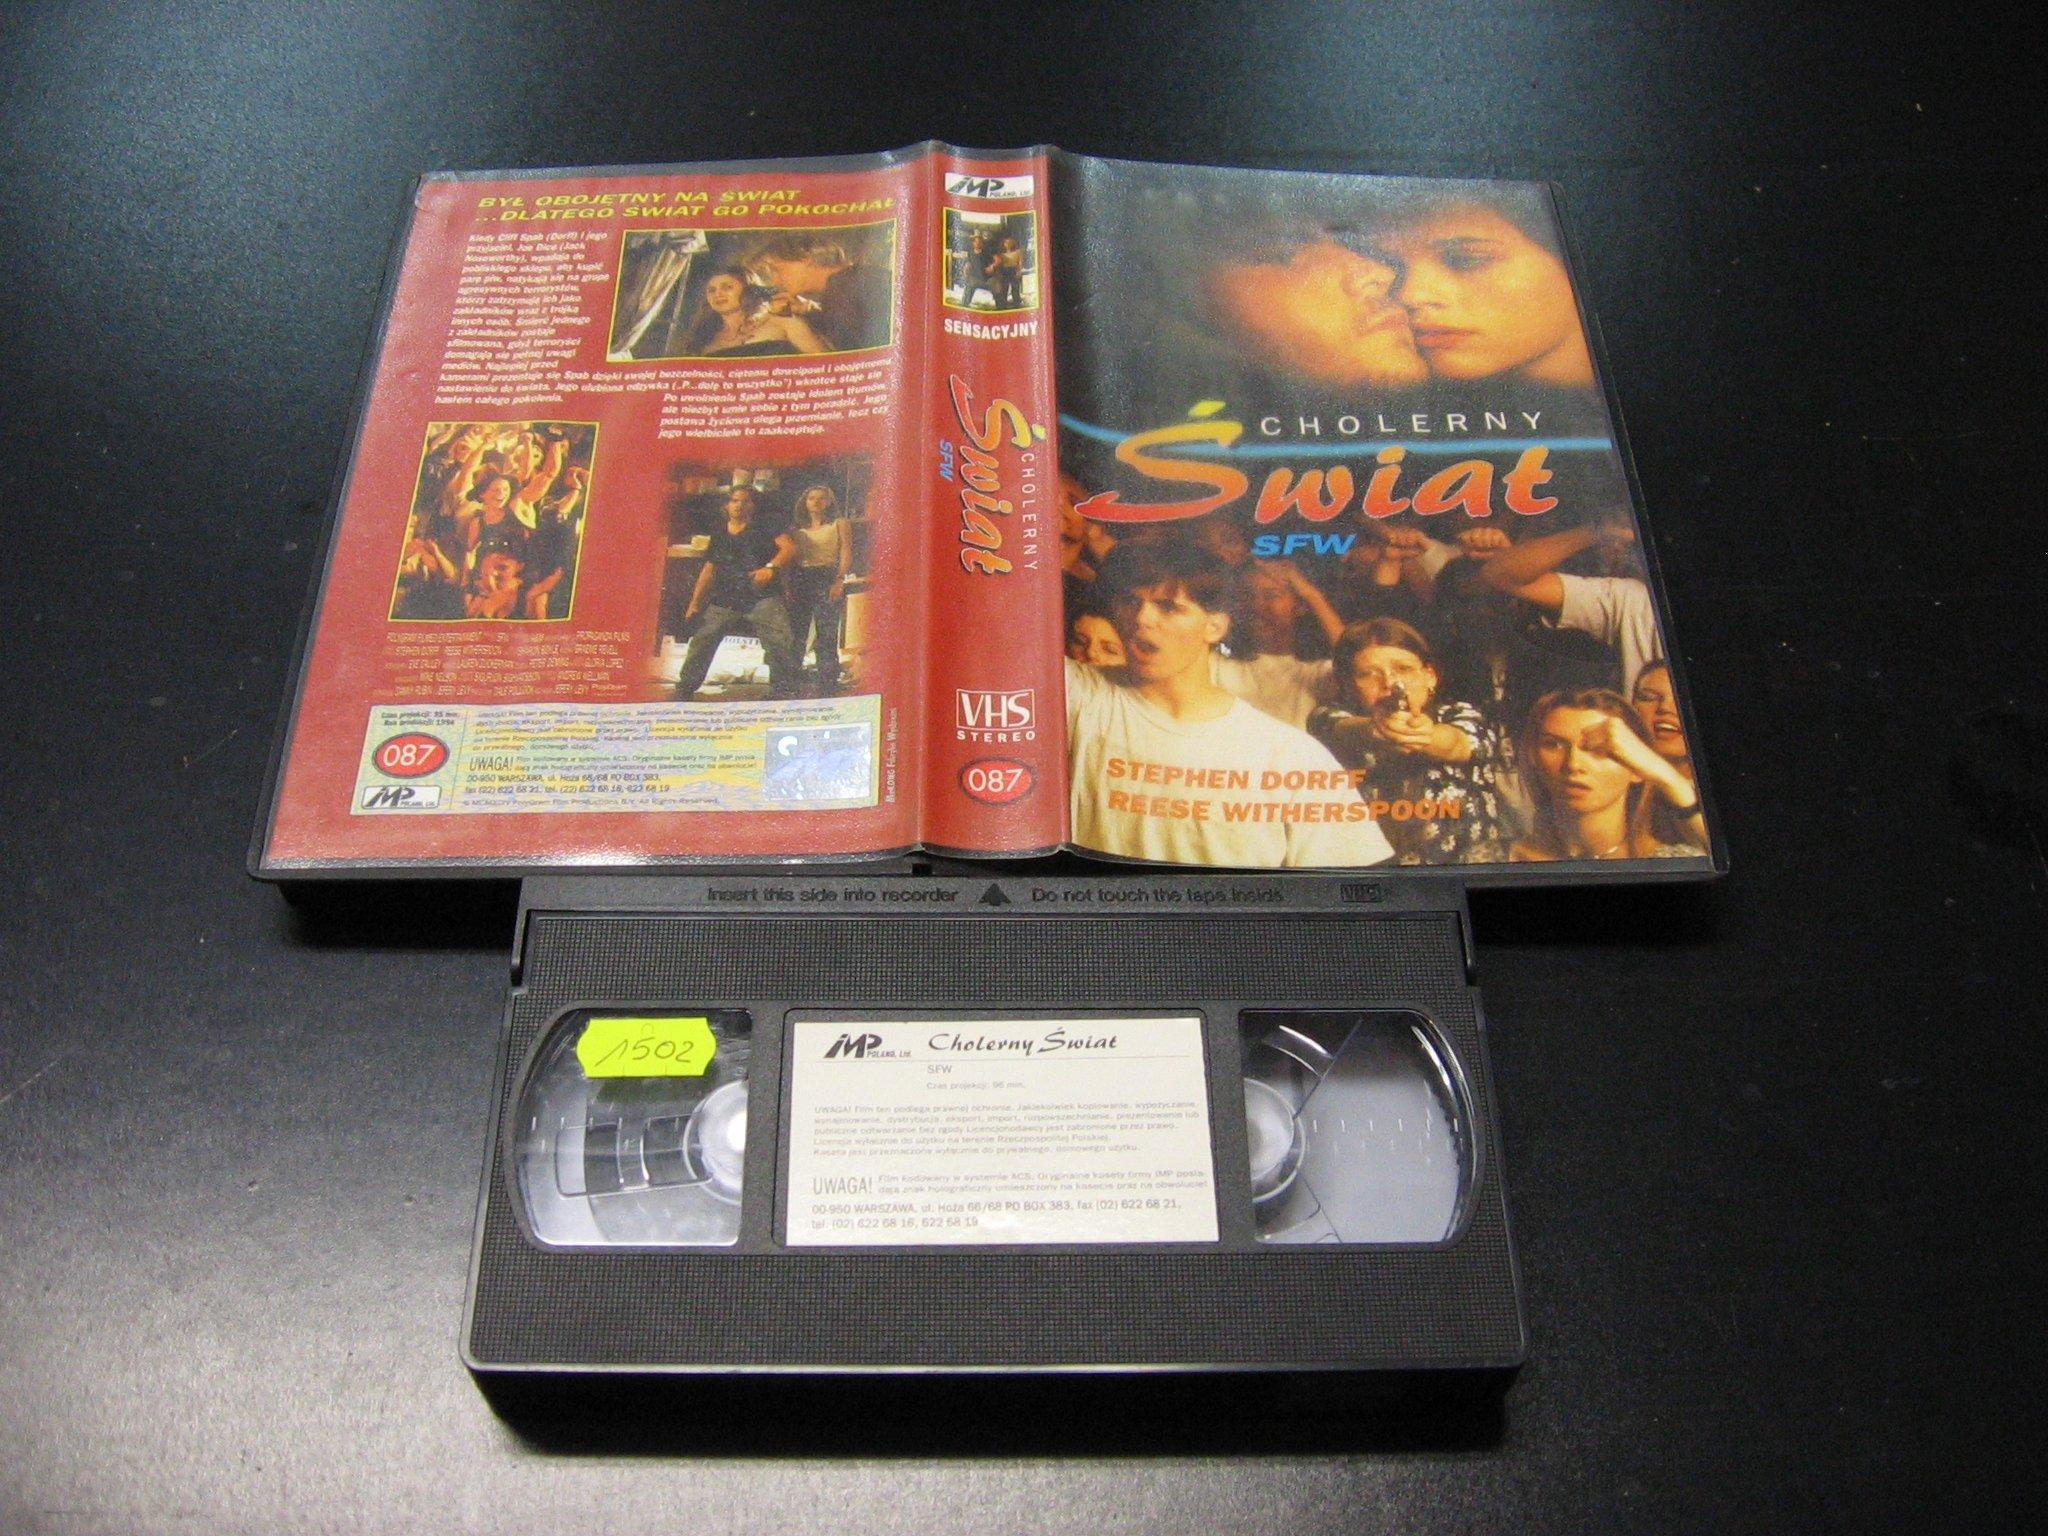 CHOLERNY ŚWIAT SFW -  kaseta VHS - 0996 Opole - AlleOpole.pl